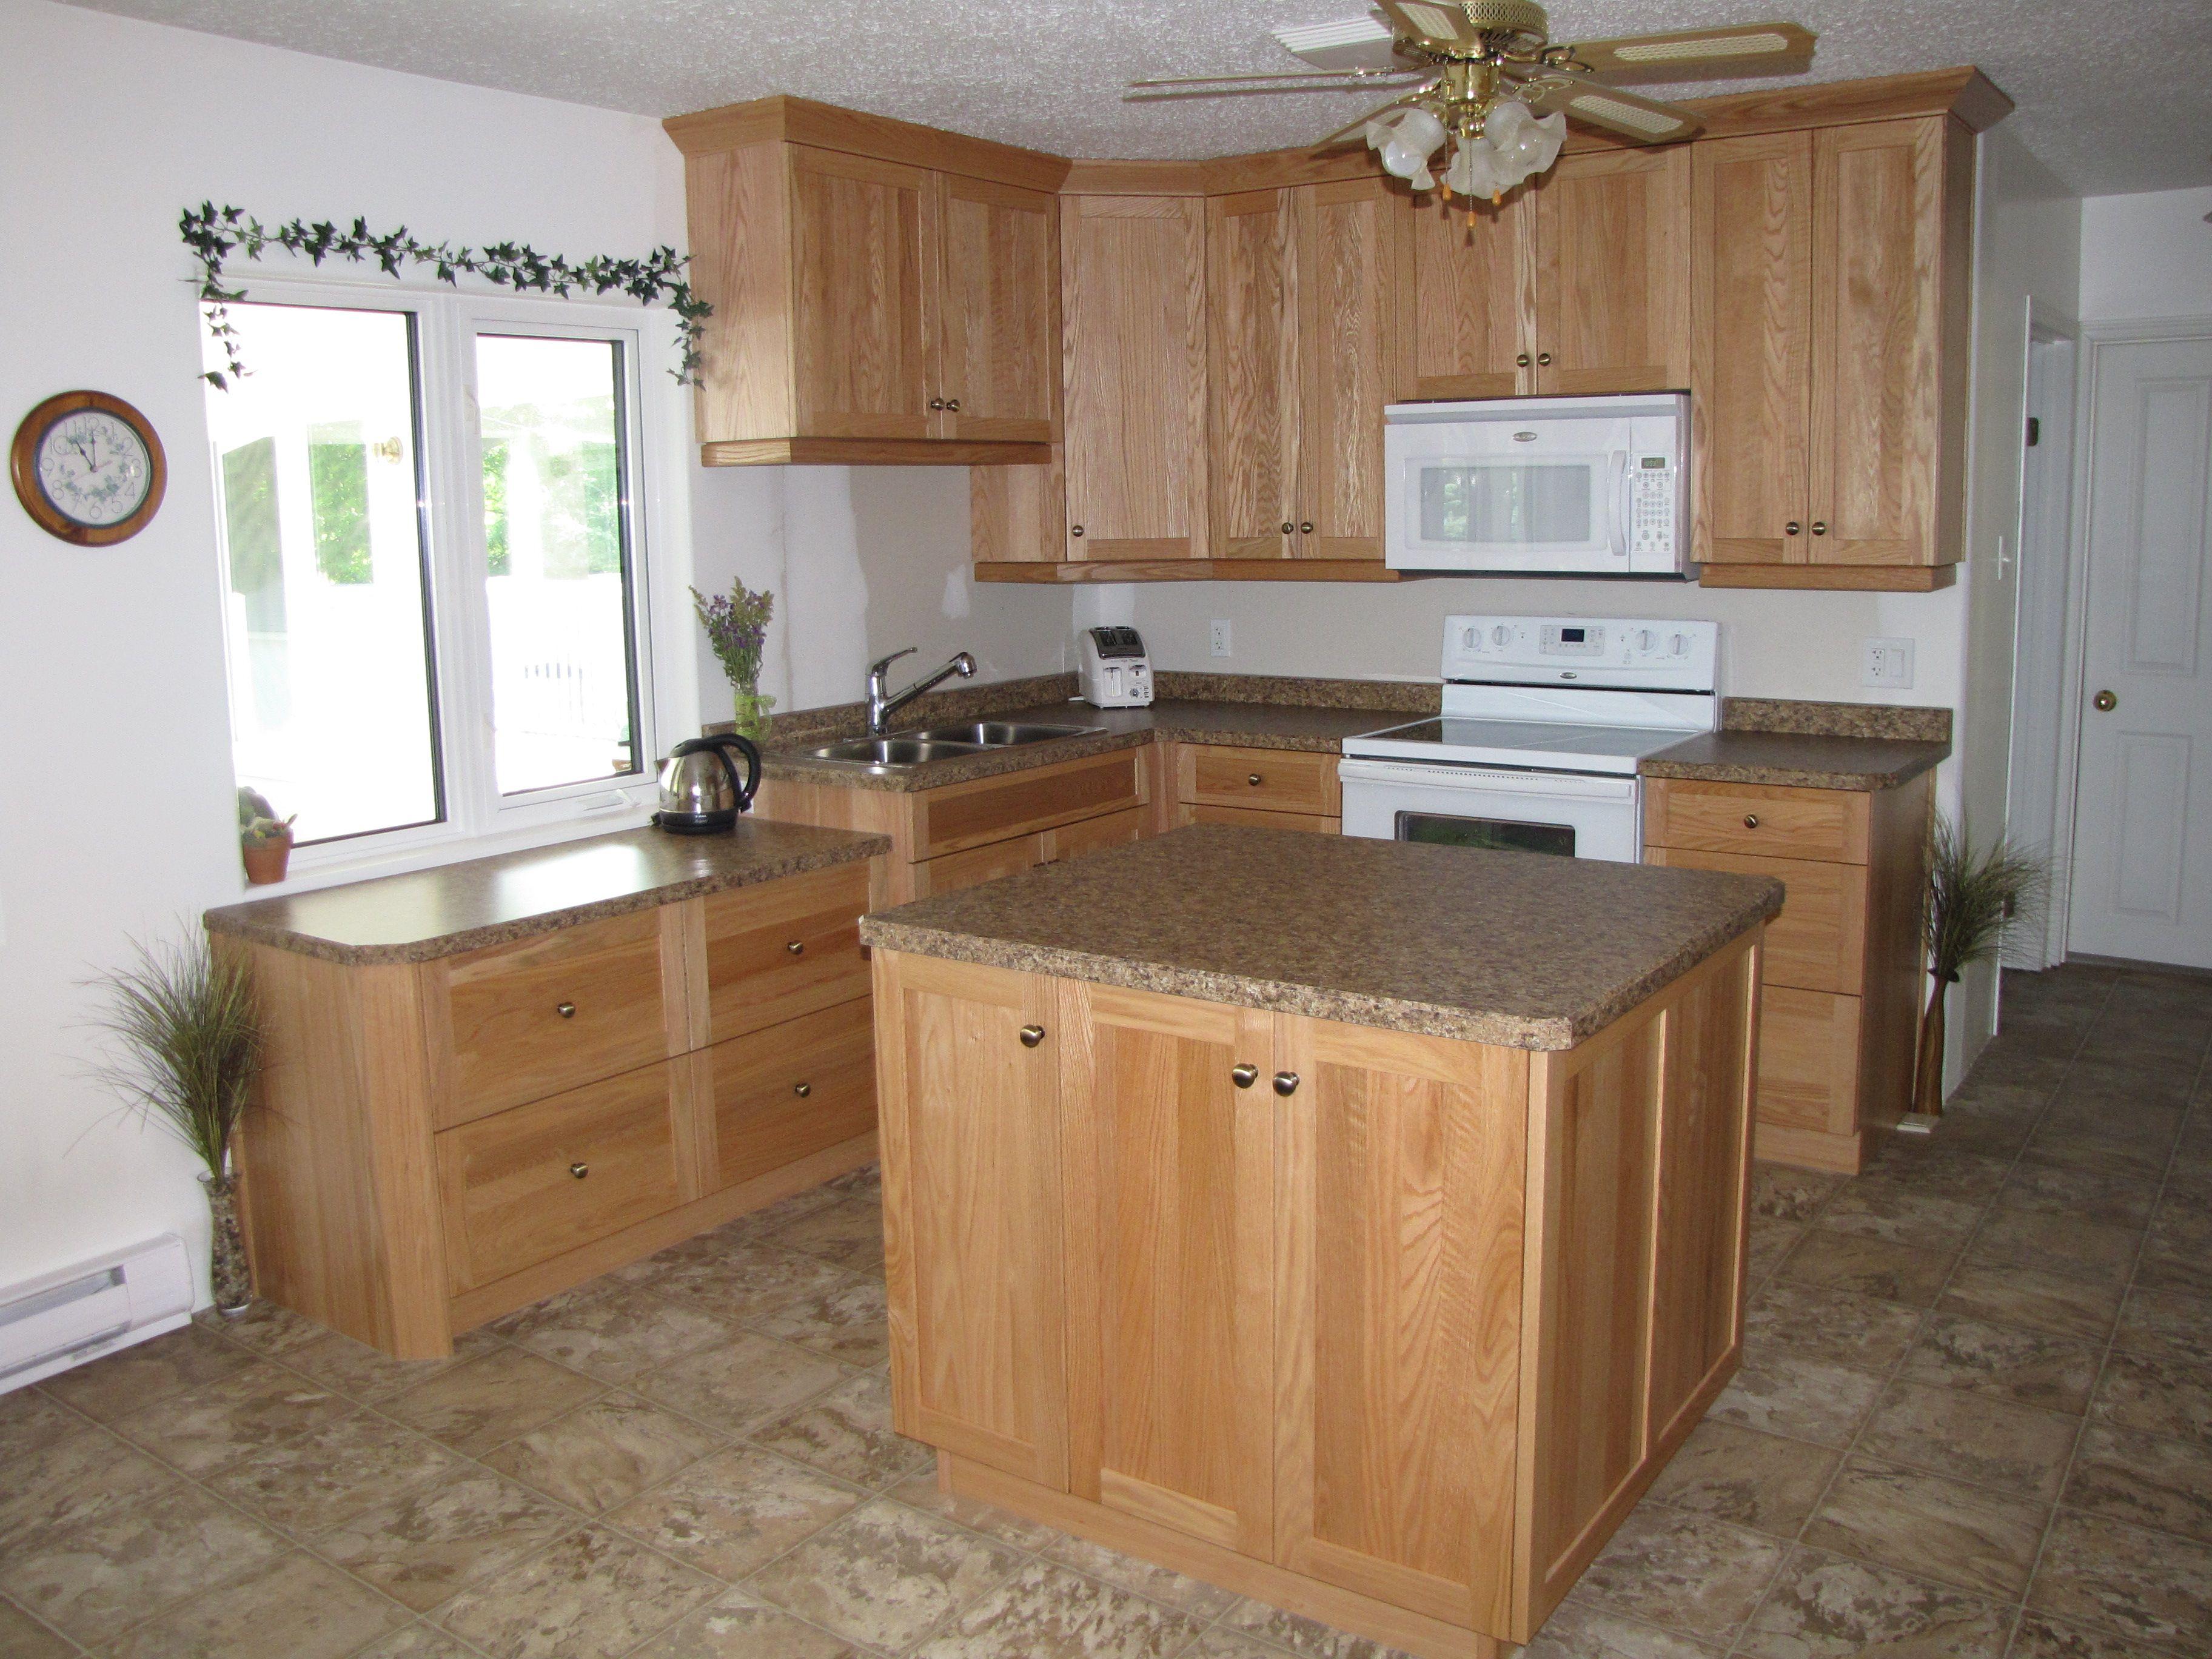 Uncategorized Formica Laminate Kitchen Countertops cabinets oak natural countertop wilsonart laminate milano amber